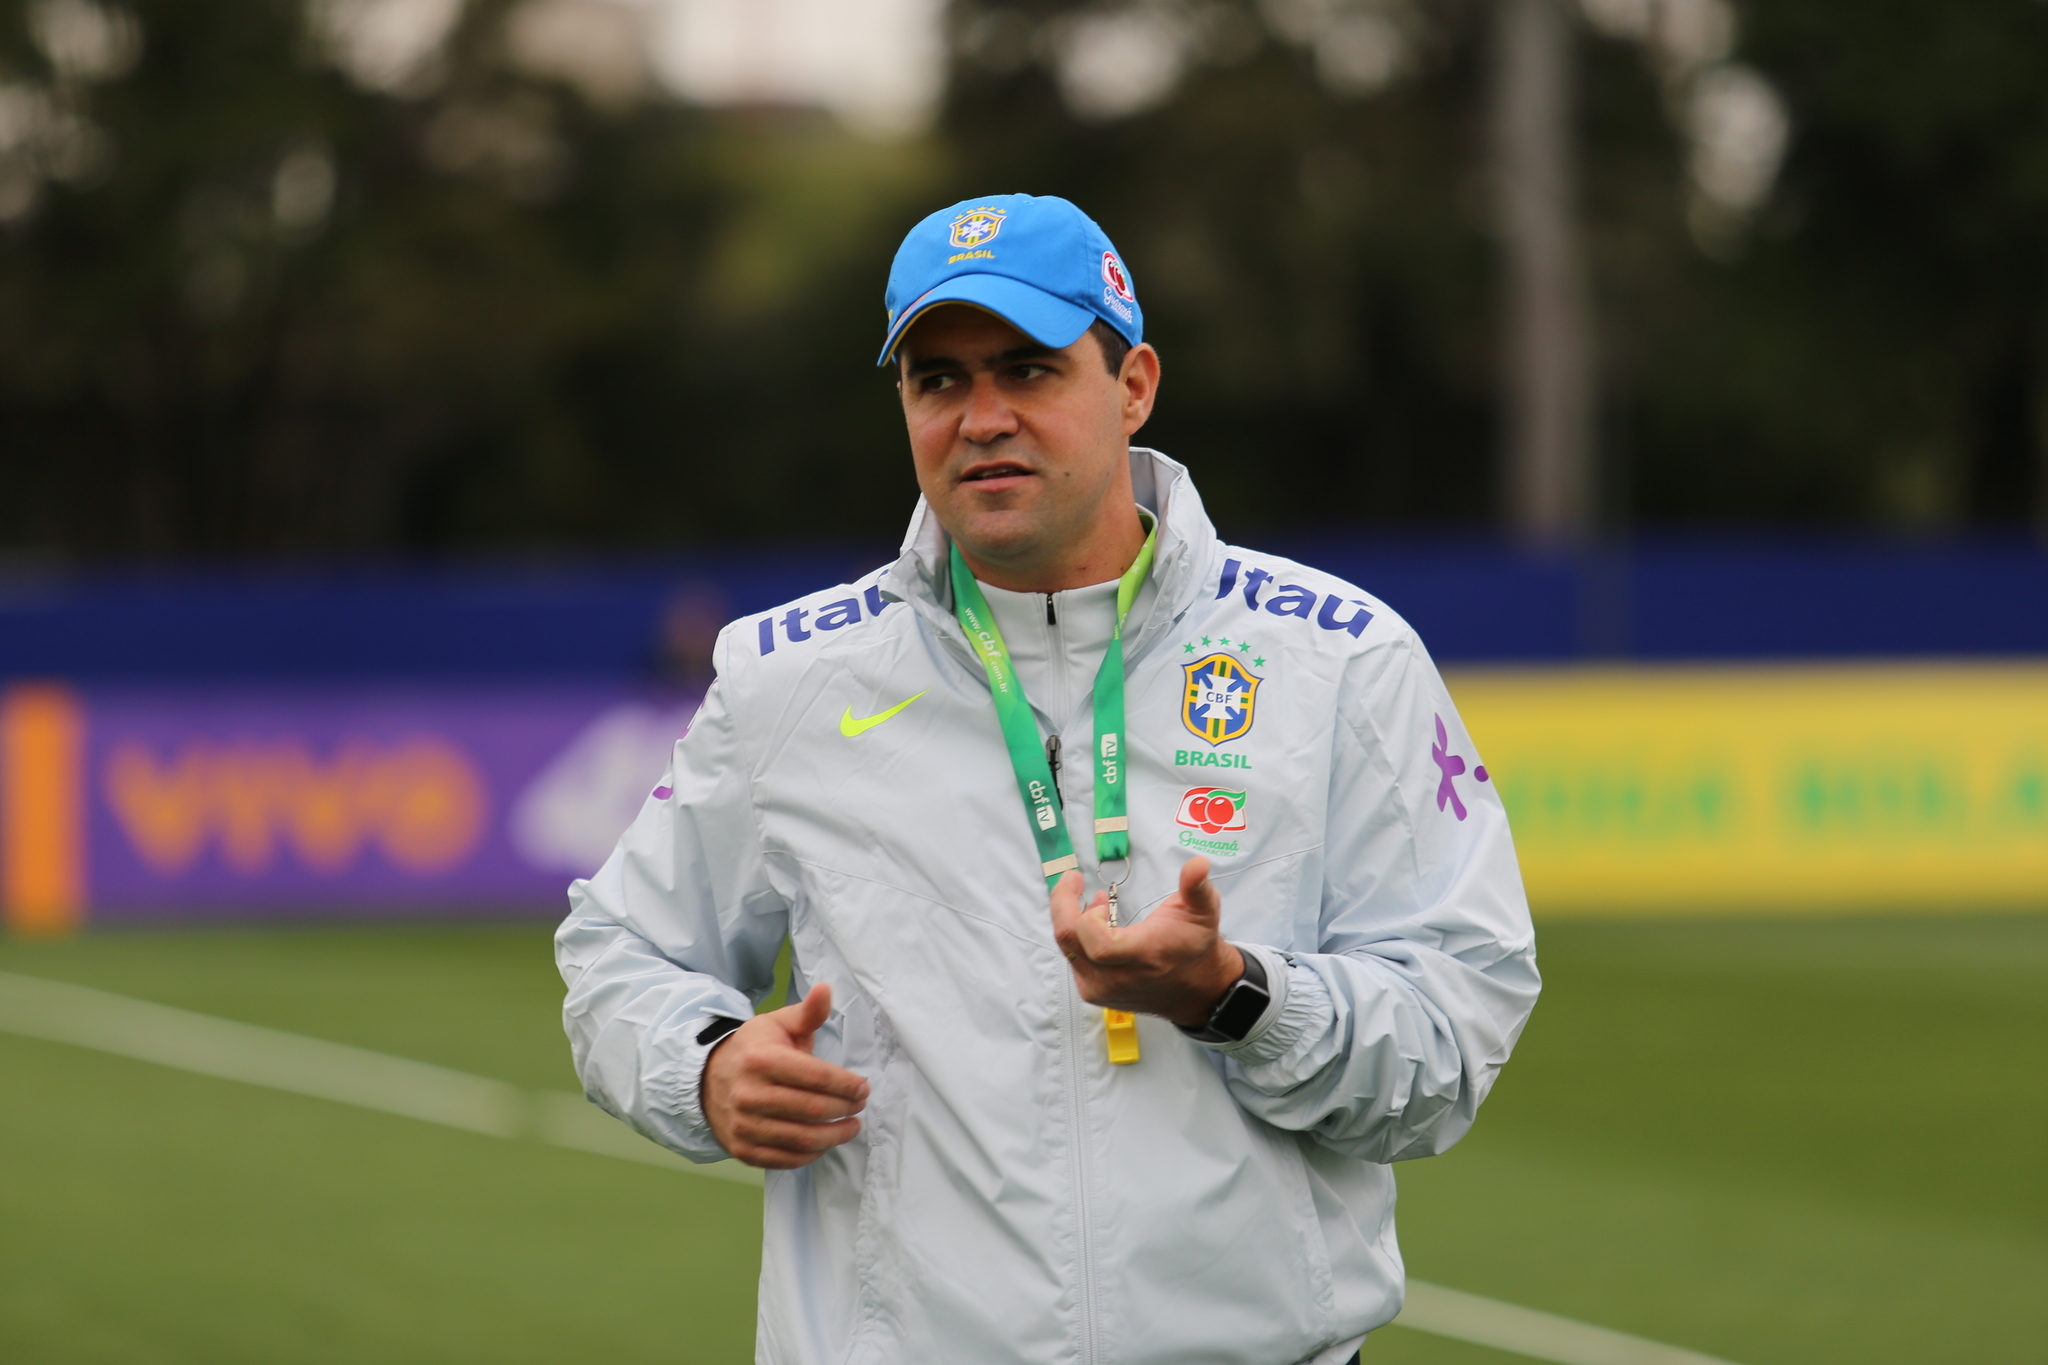 O técnico AnFIFA estuda alterar idade limite após adiamento das Olimpíadas